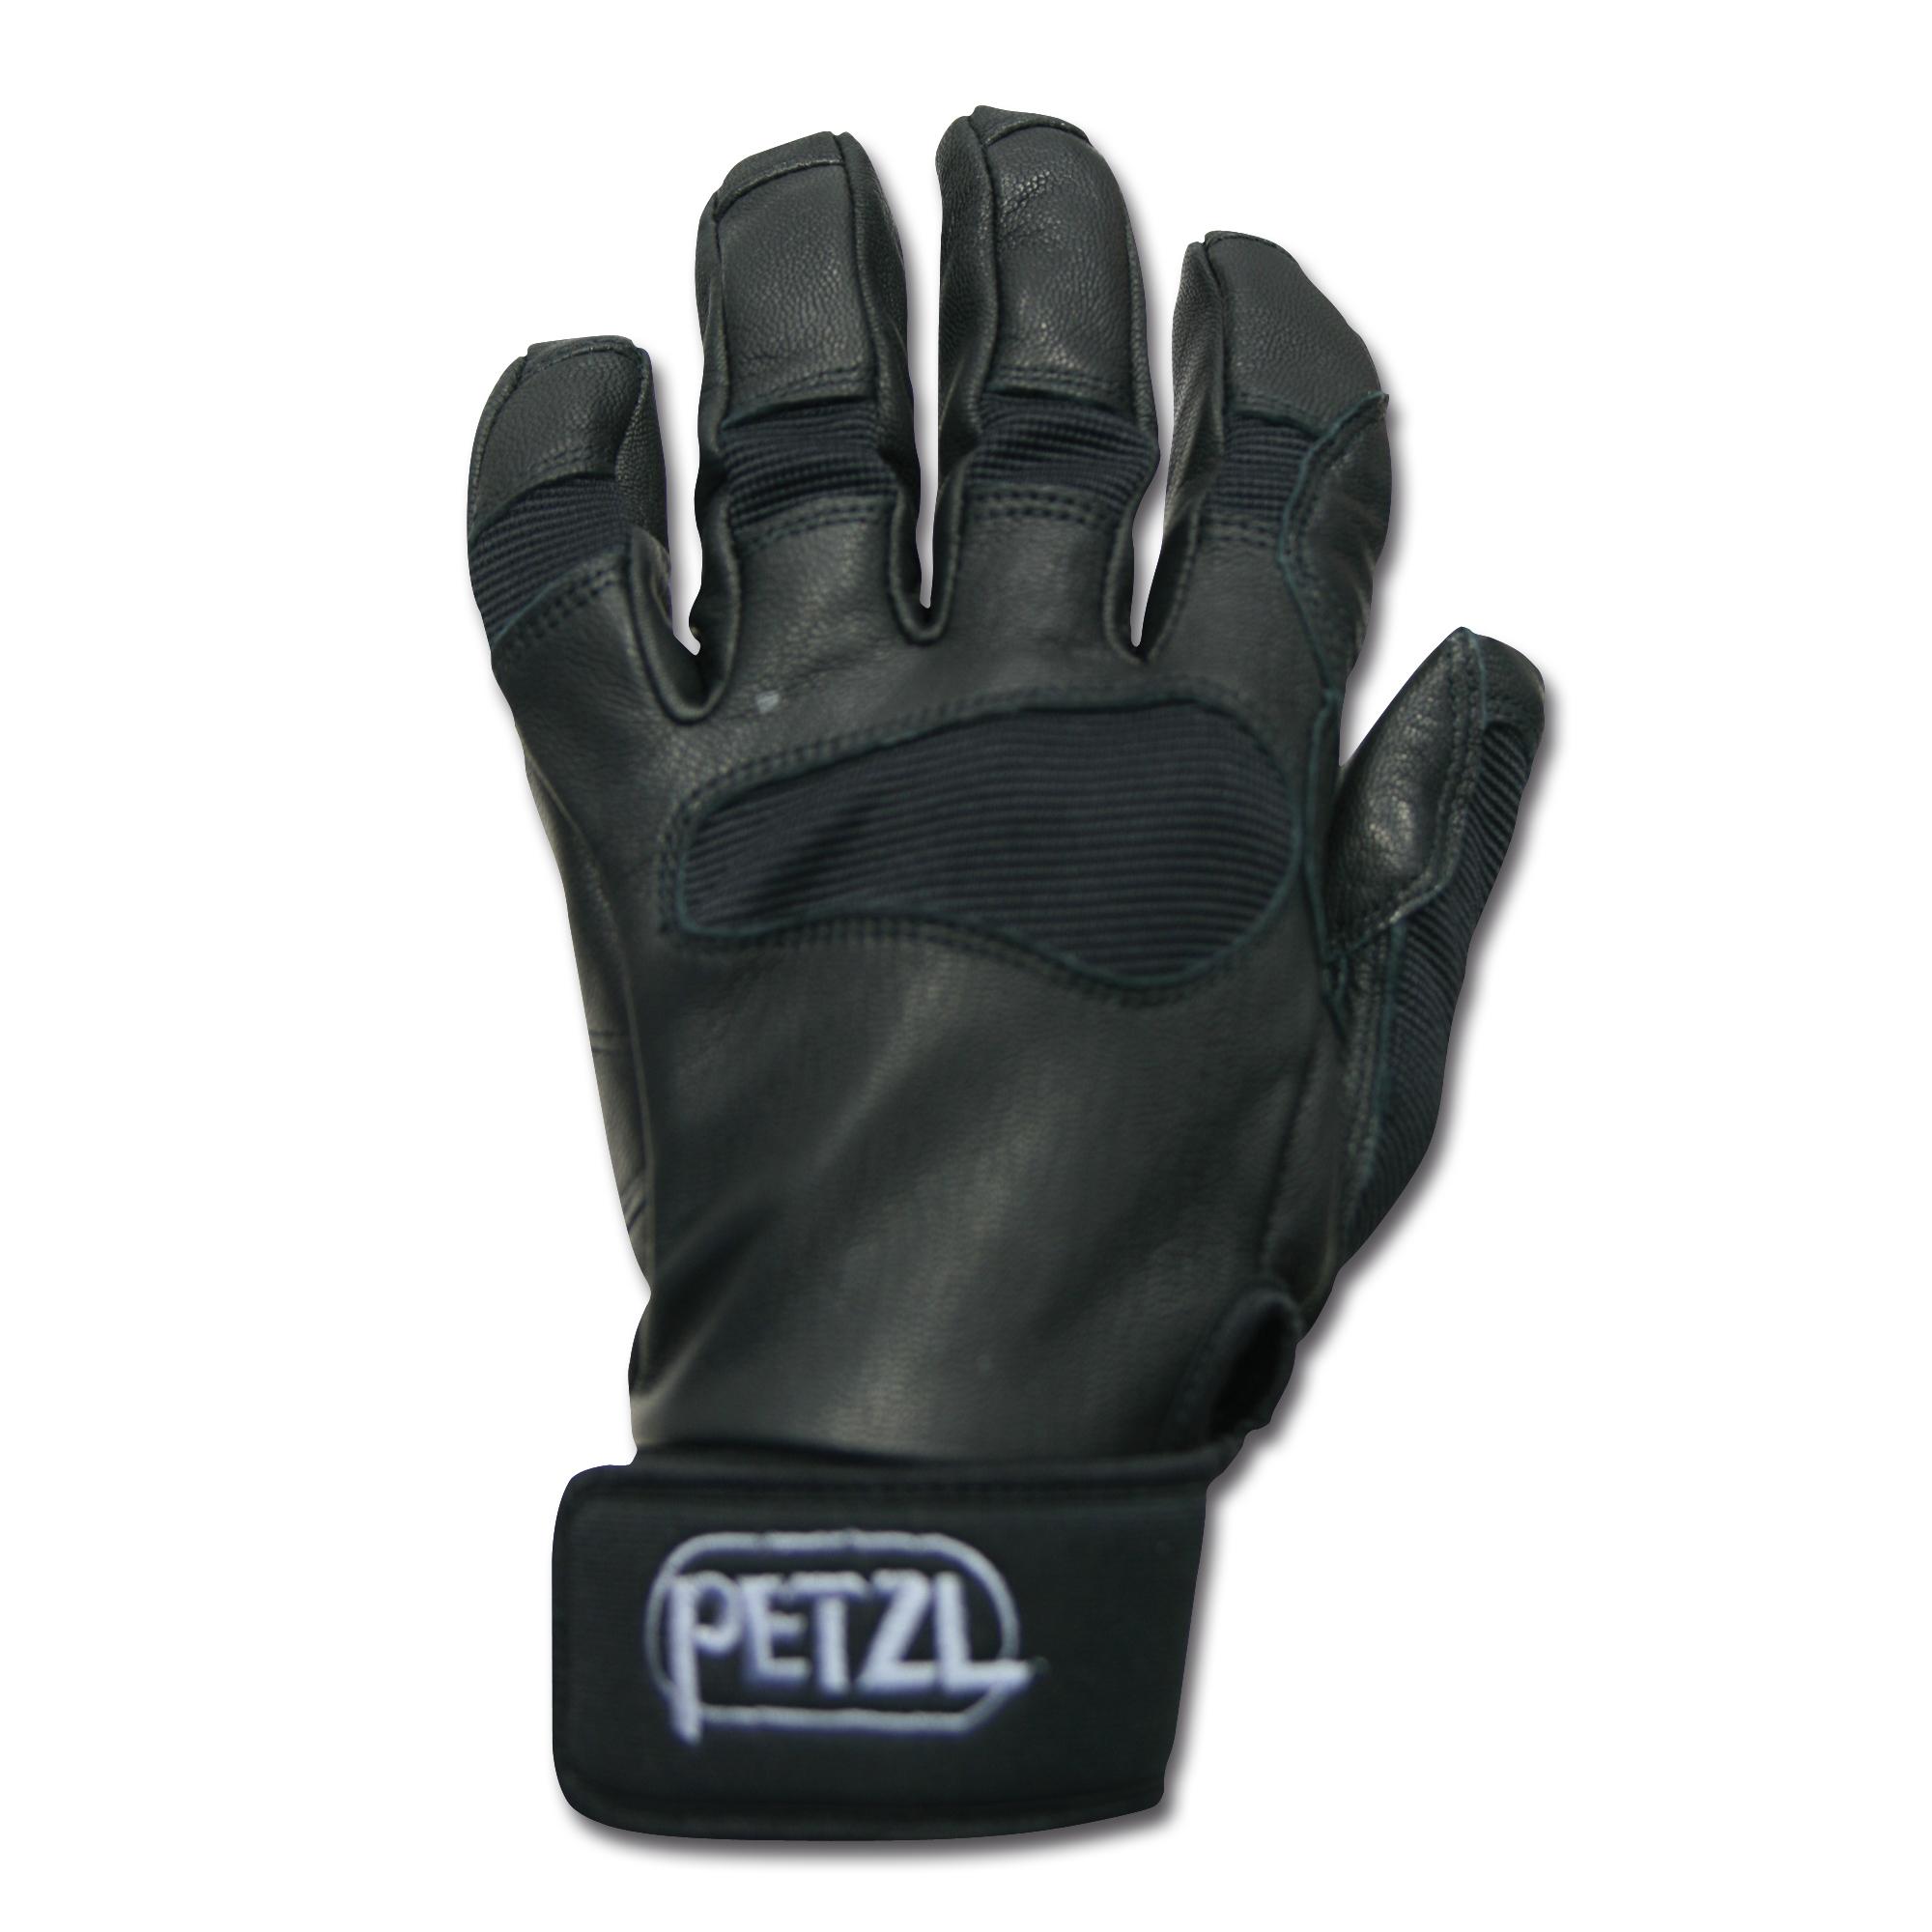 Handschuhe Petzl Cordex Plus schwarz